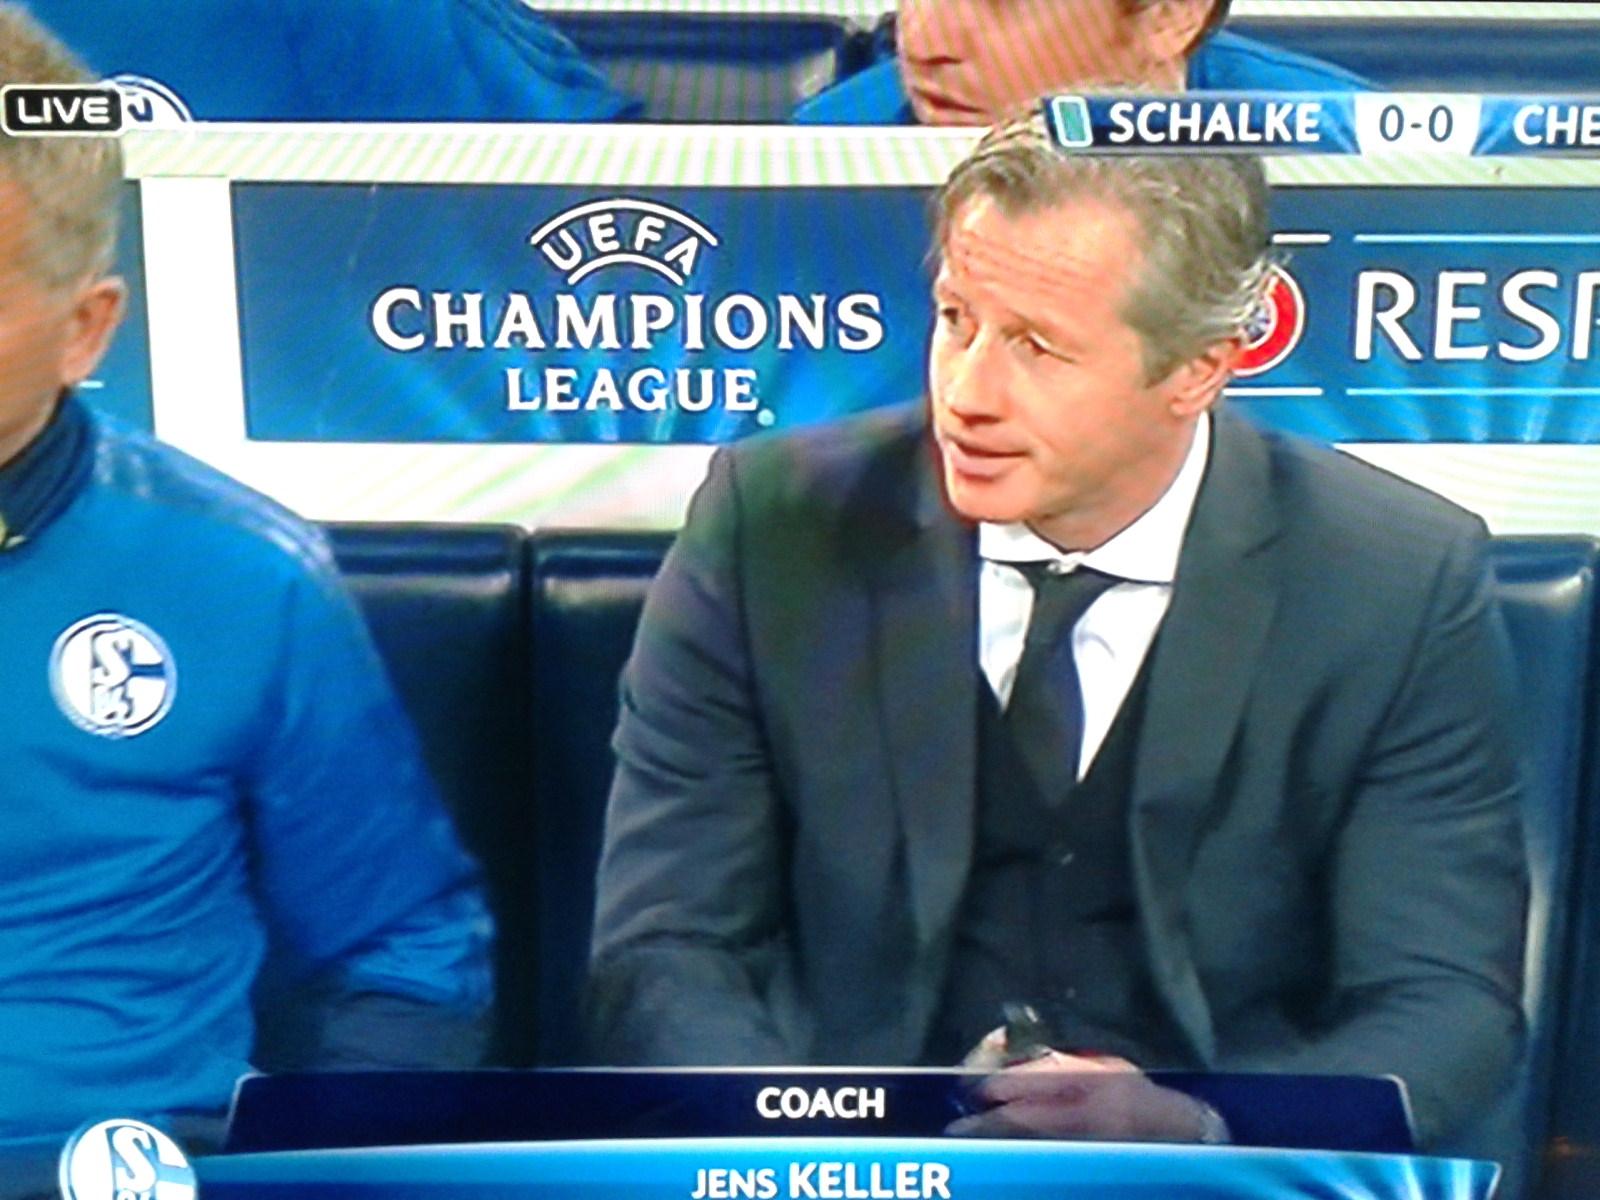 Schalke-Trainer Jens Keller